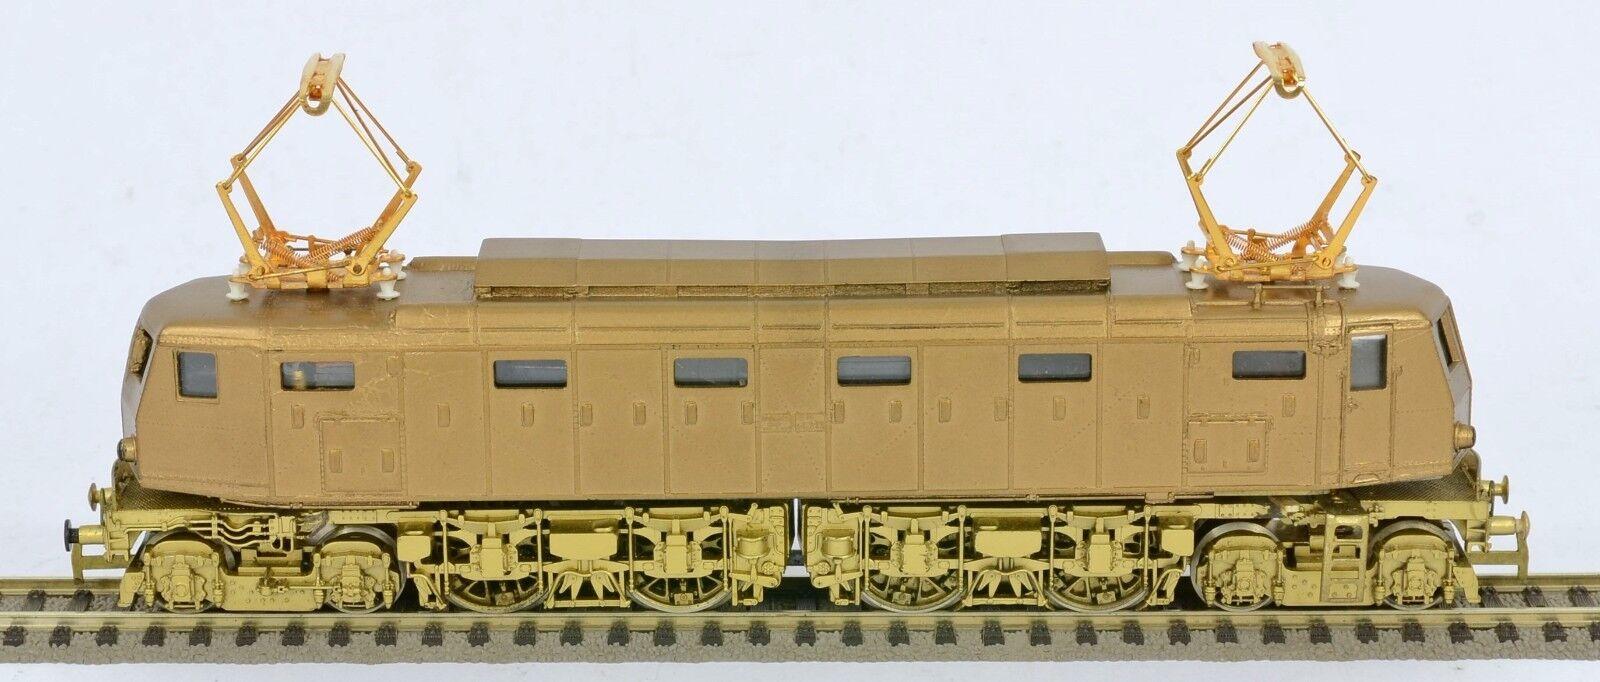 RARE RIVAROSSI HO FS E428 SERIE gold RUNNER LIGHTS SEE DESCRIPTION & PHOTOS.